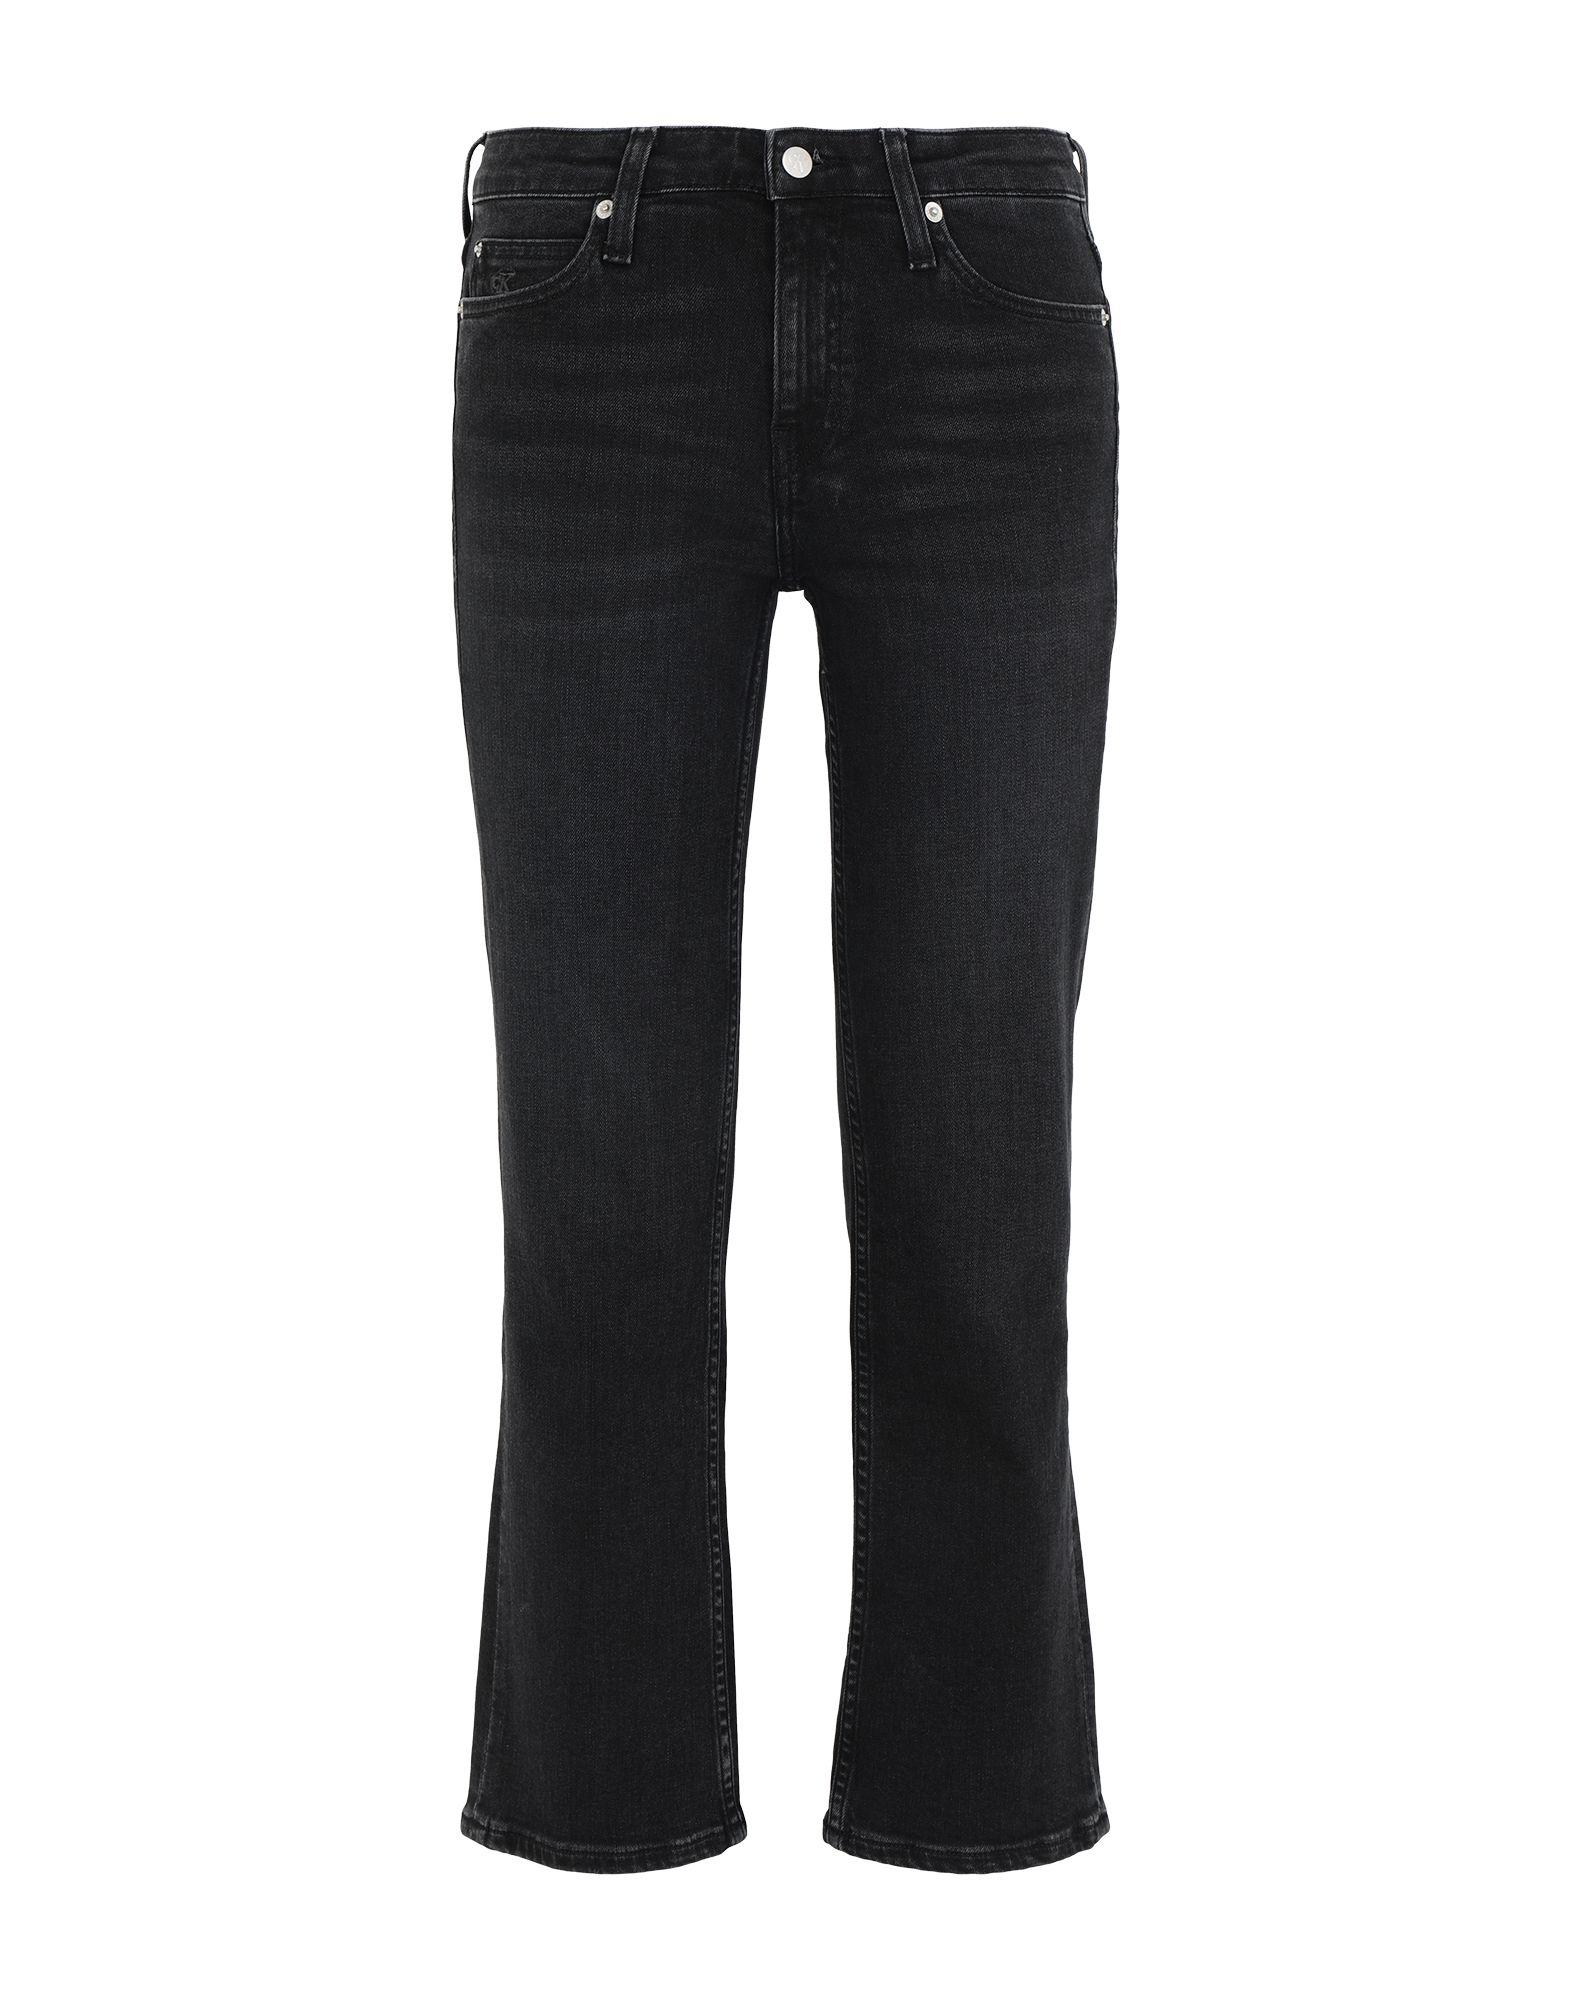 CALVIN KLEIN JEANS Джинсовые брюки-капри цена 2017